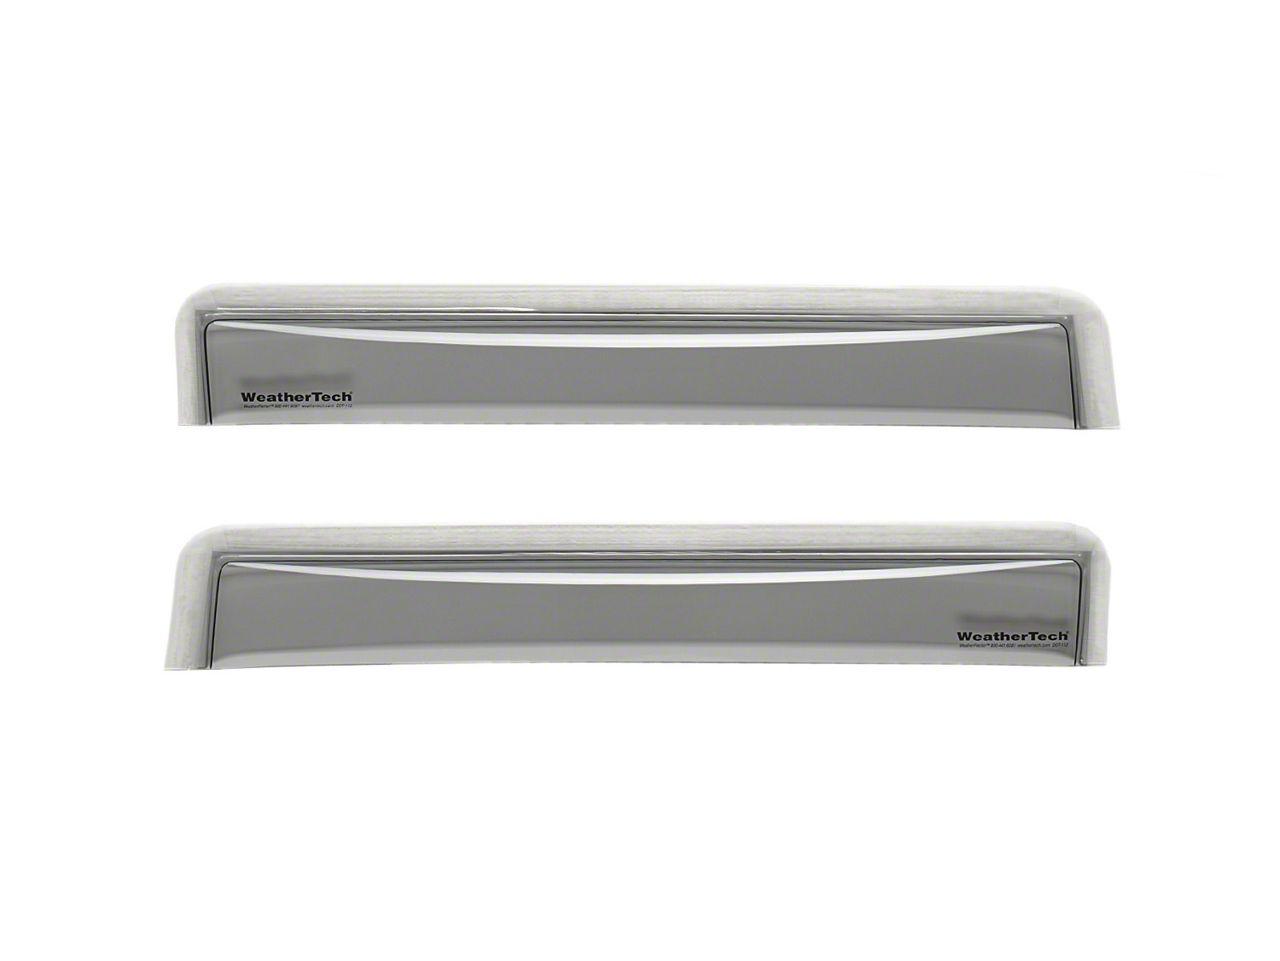 Weathertech Rear Side Window Deflectors - Light Smoke (16-19 Tacoma Double Cab)